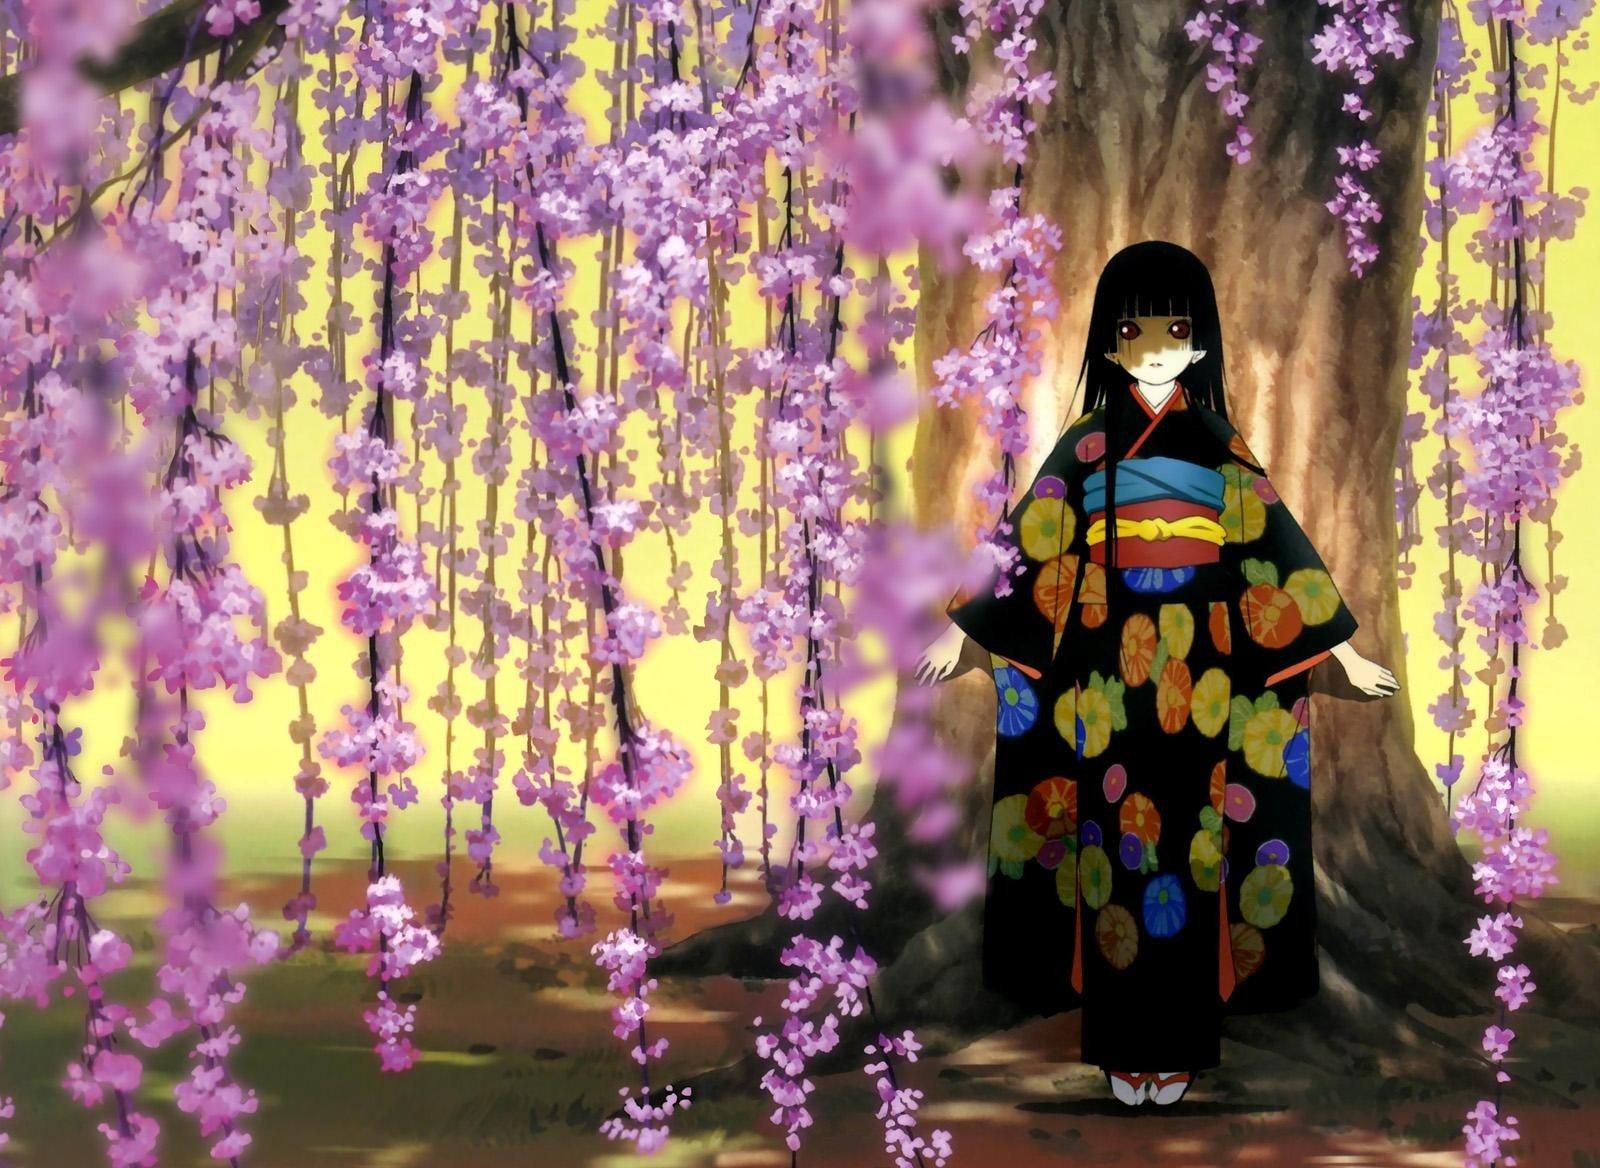 Обои Япония, шоссе, Shin mimura, цветущая вишня. Города foto 8